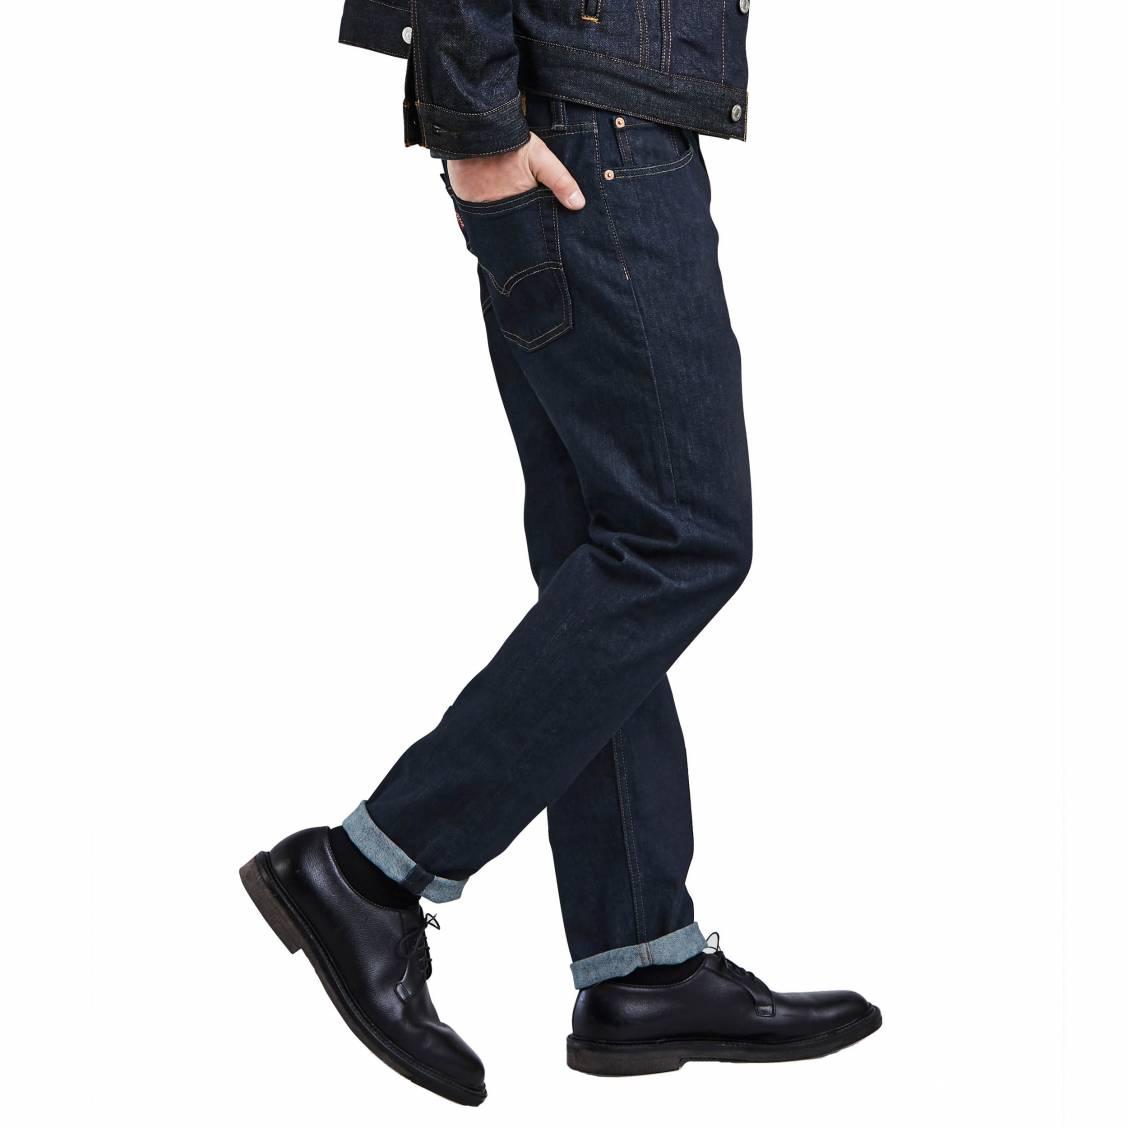 4e9ba4a7aede1 ... Jean Levi s 502 Regular Taper Midnight Carbon en coton stretch bleu  nuit ...